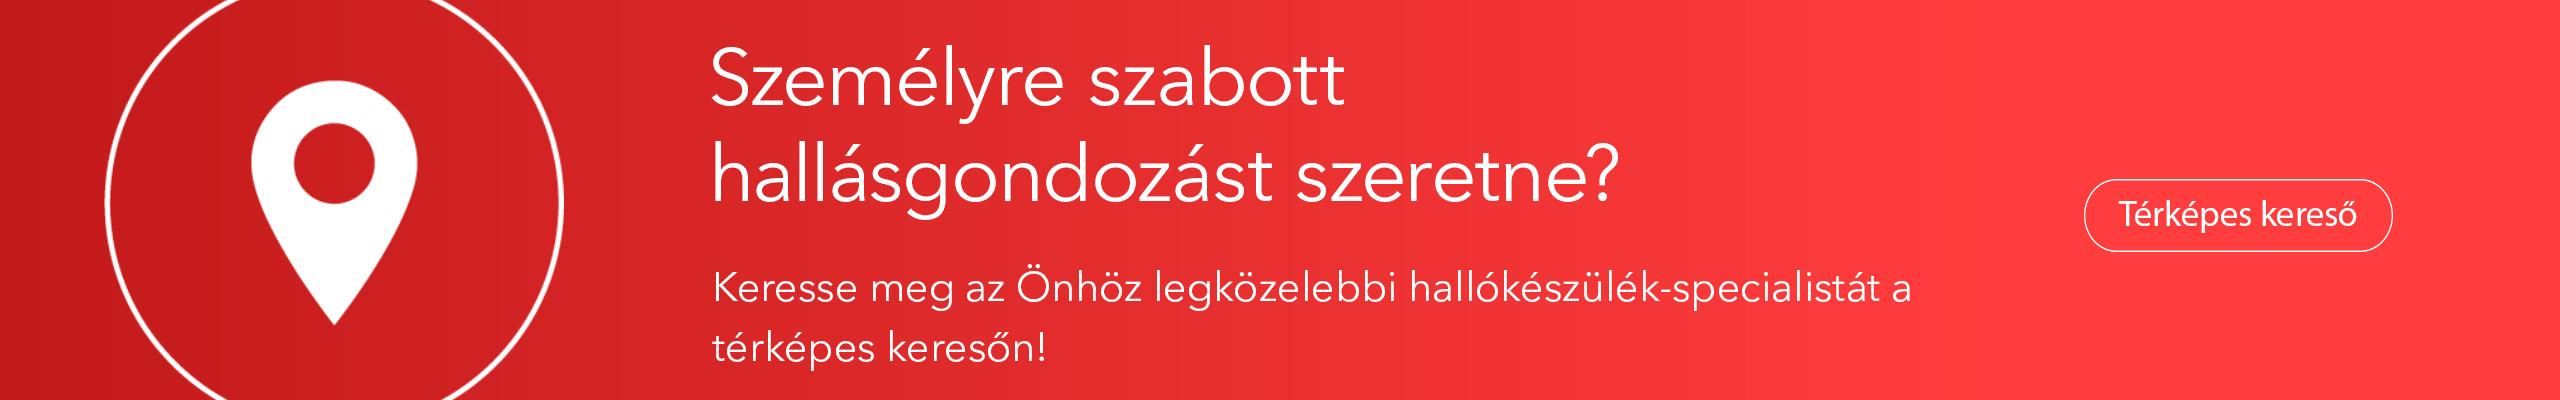 StoreLocator_teaser_2560x400_HU